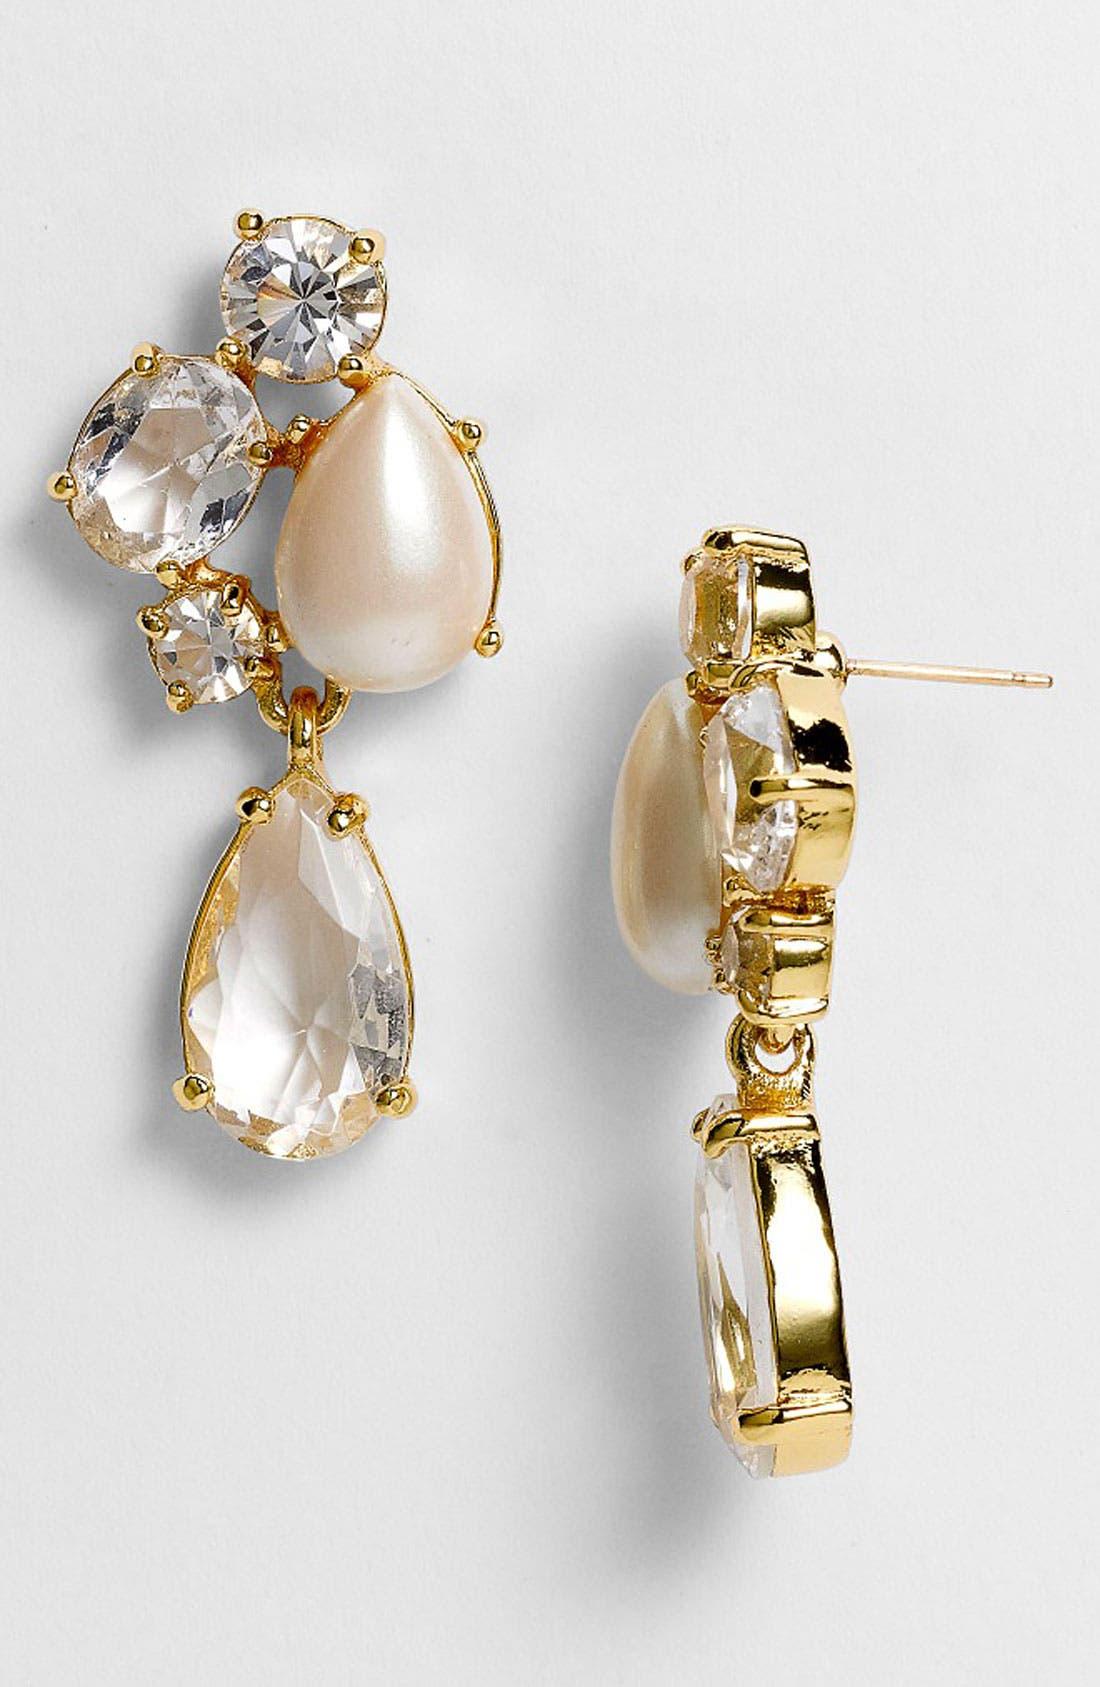 Alternate Image 1 Selected - kate spade new york 'fragment' drop earrings